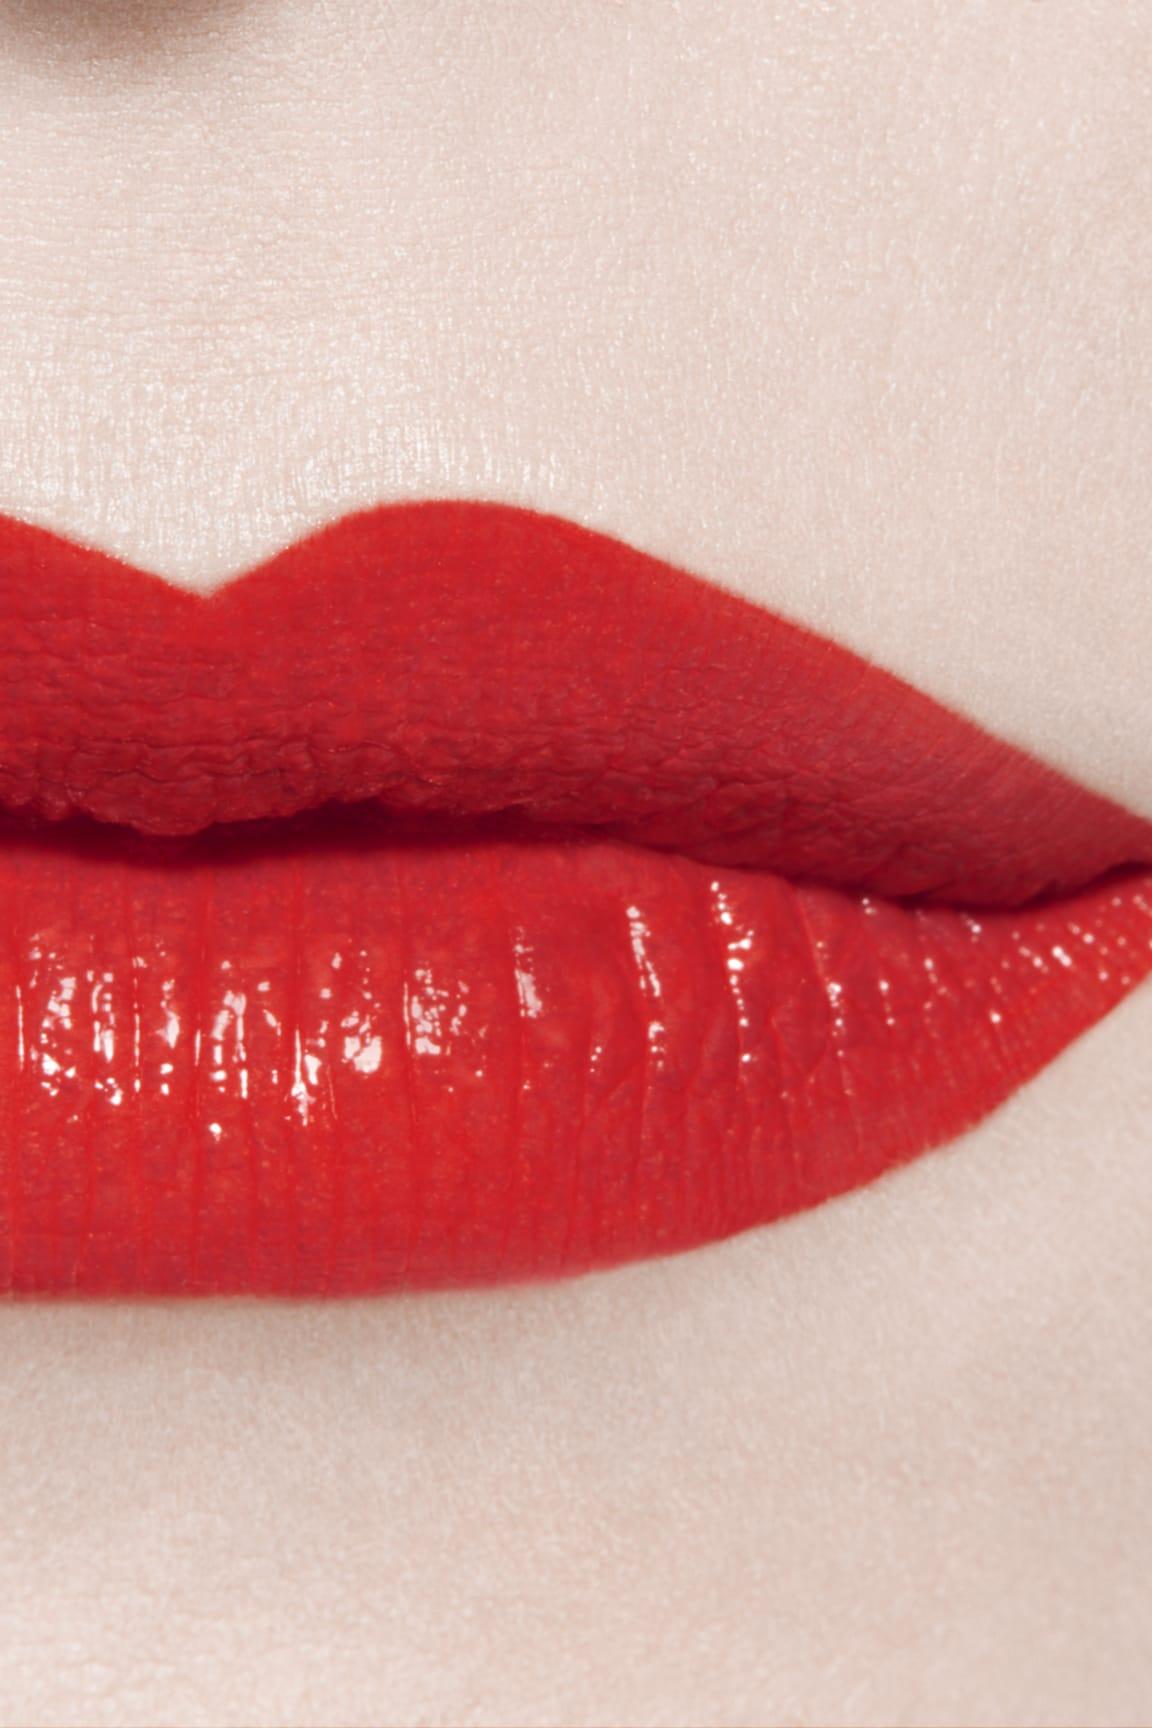 Application makeup visual 3 - ROUGE ALLURE LAQUE 68 - UNLIMITED